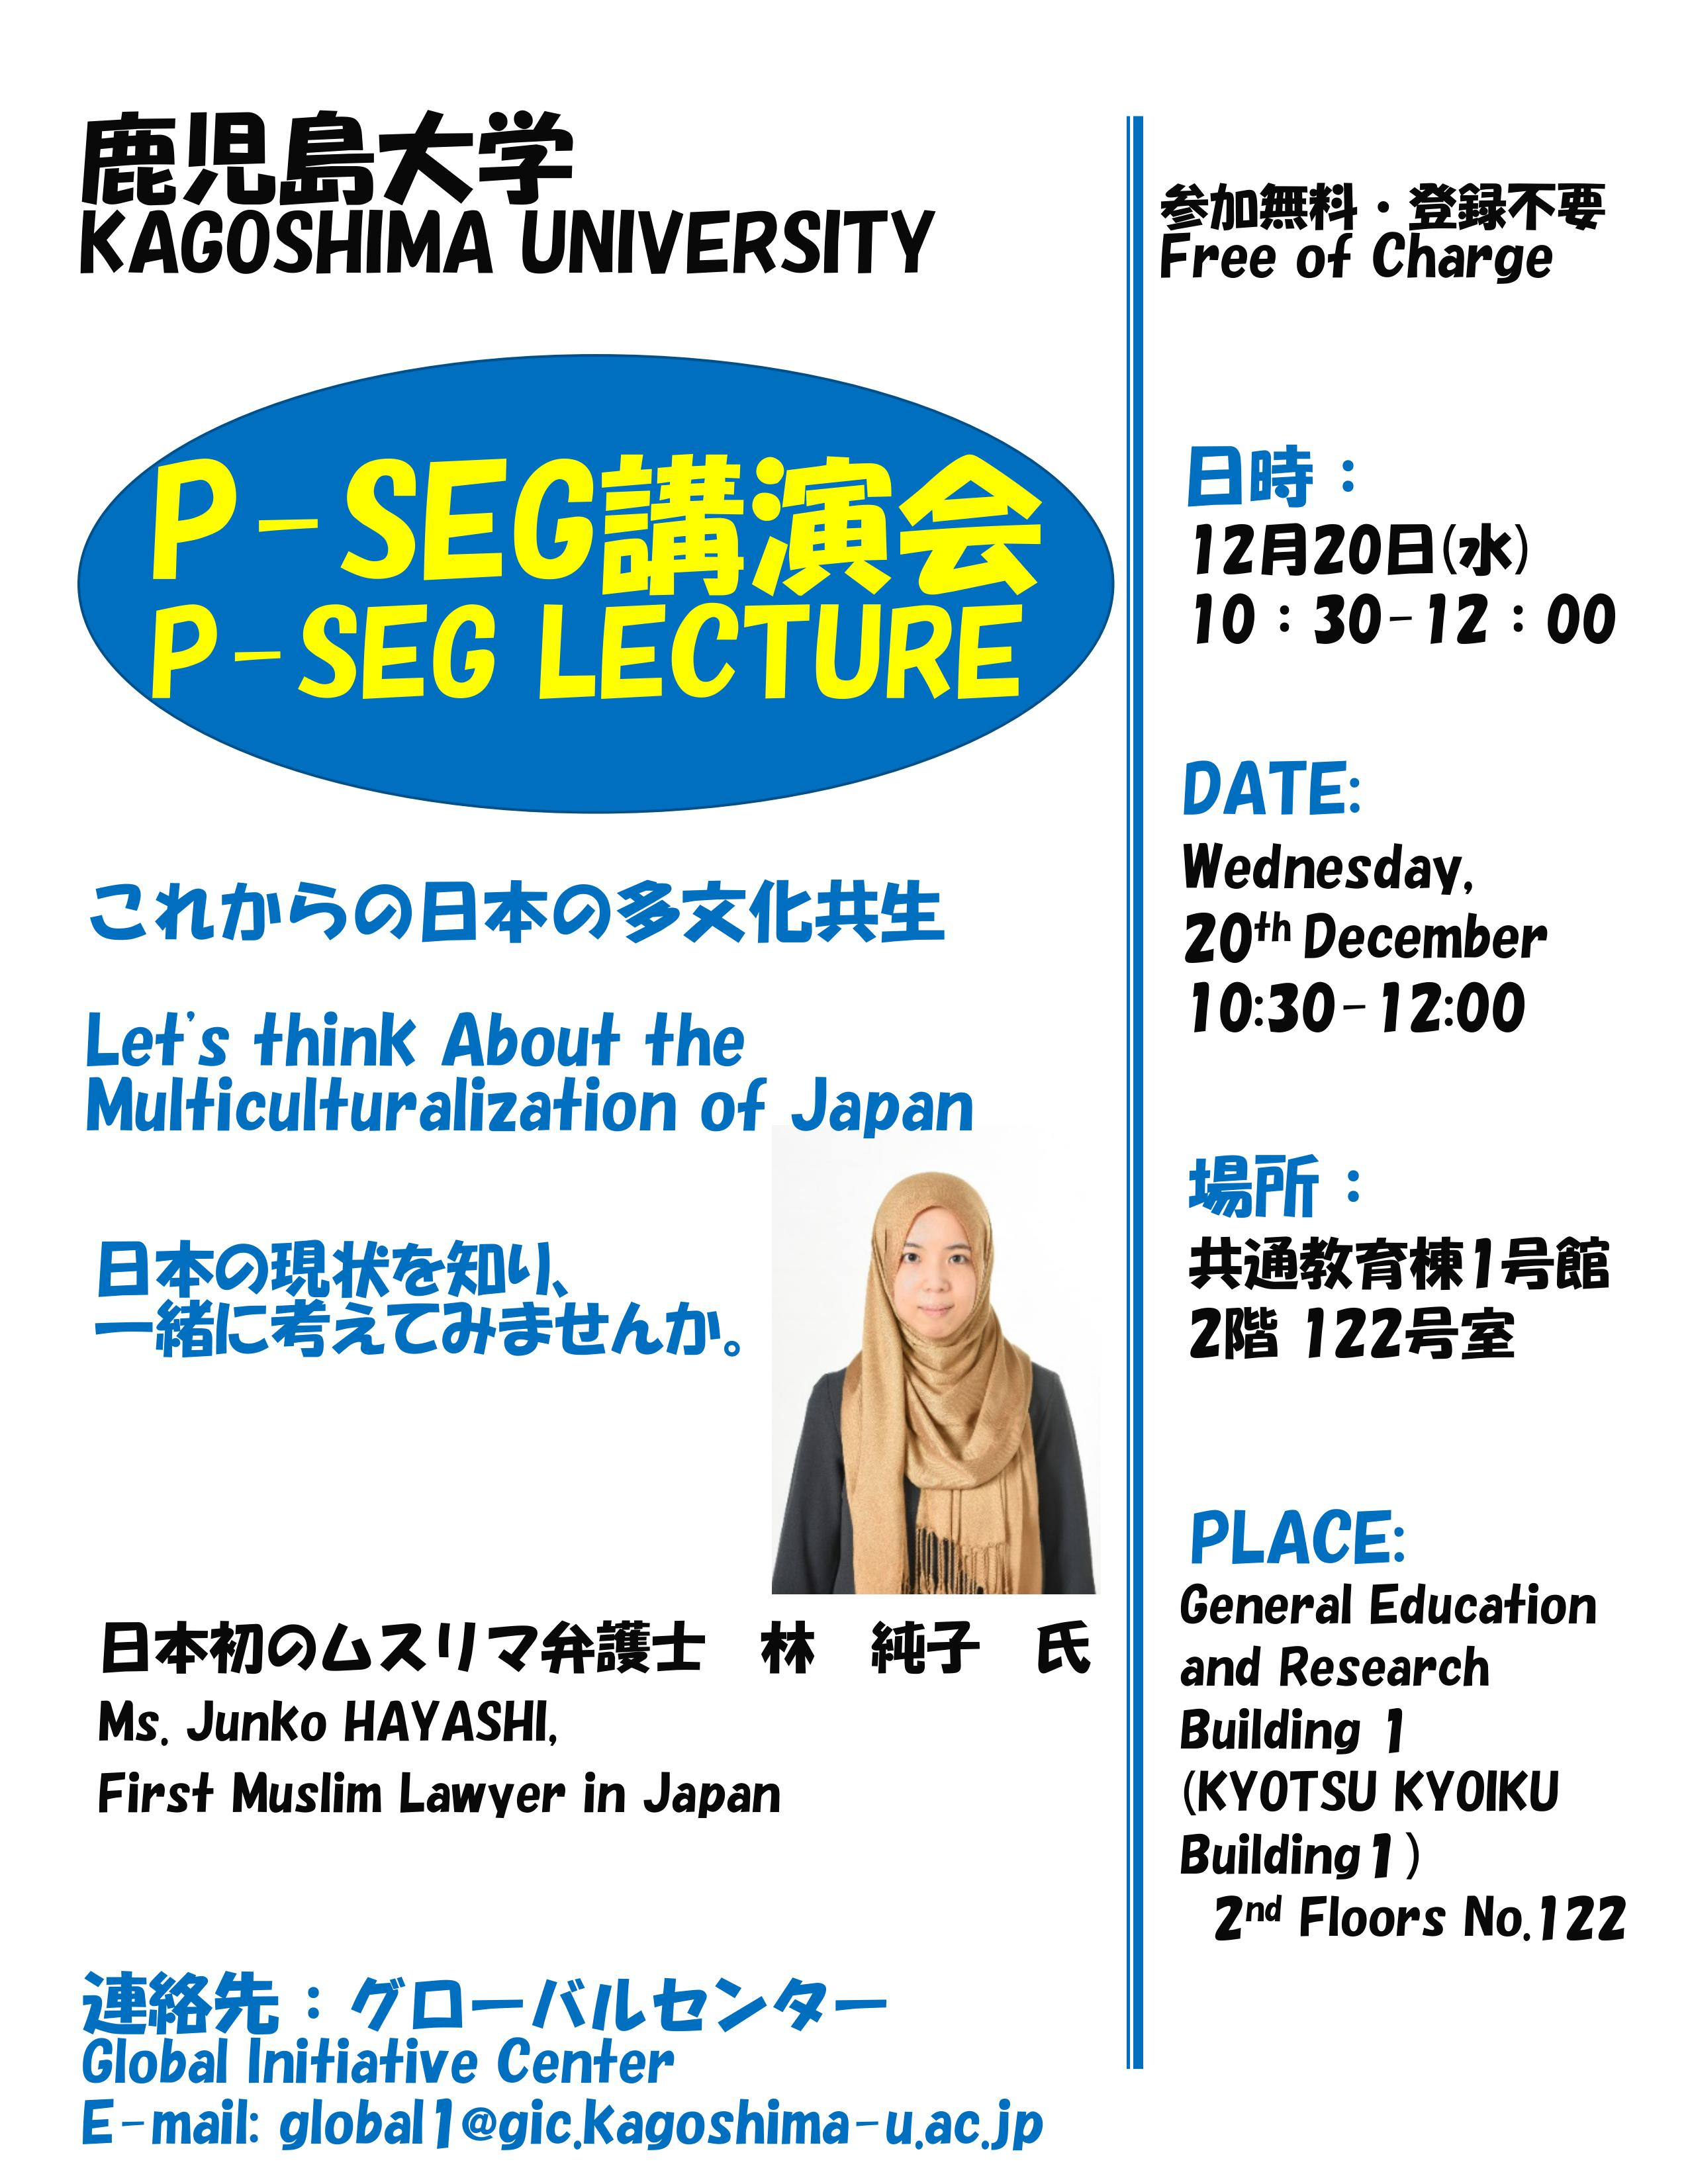 Poster_12.20 P-SEG Lecture.jpg